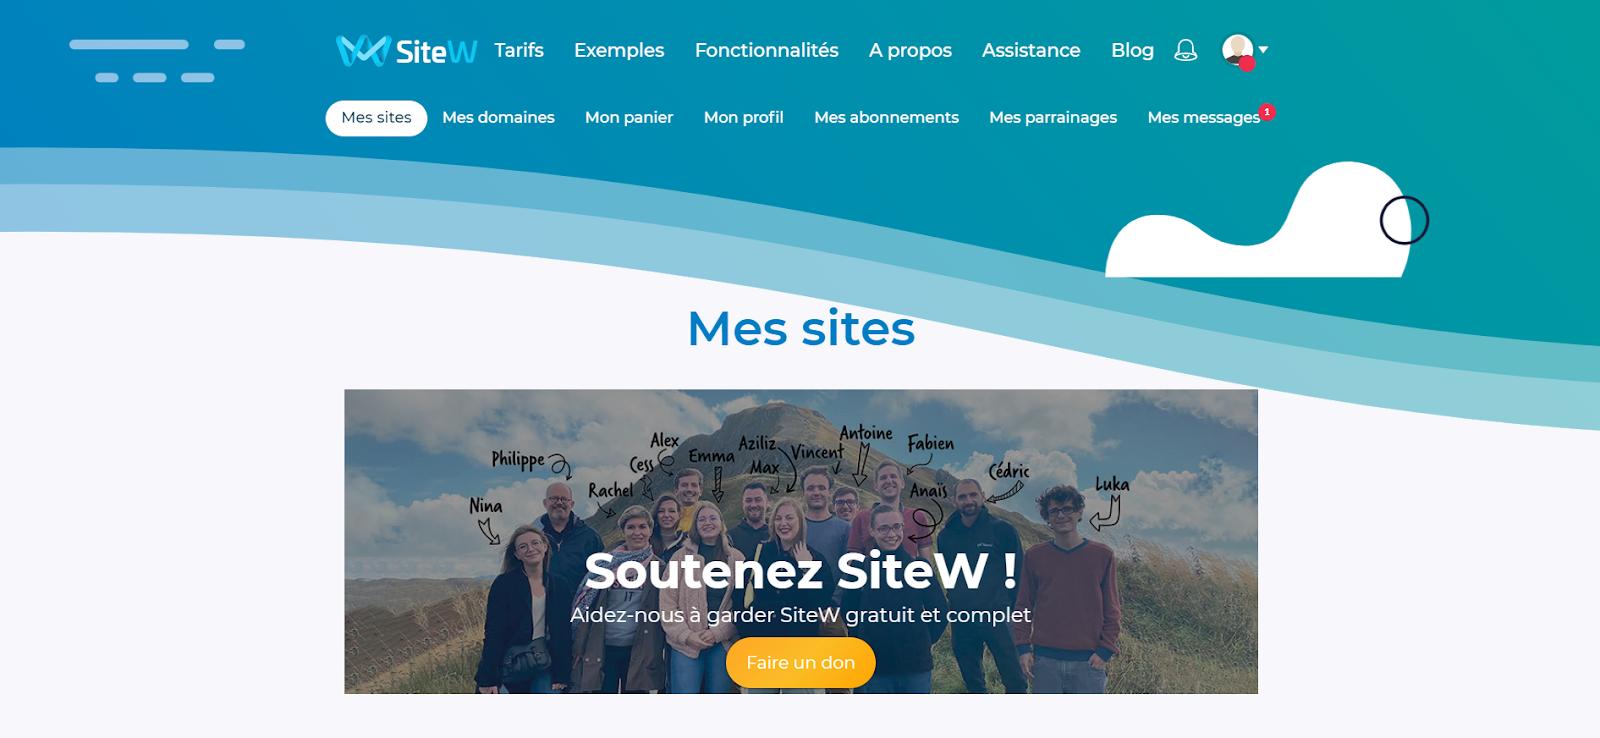 mes sites sitew